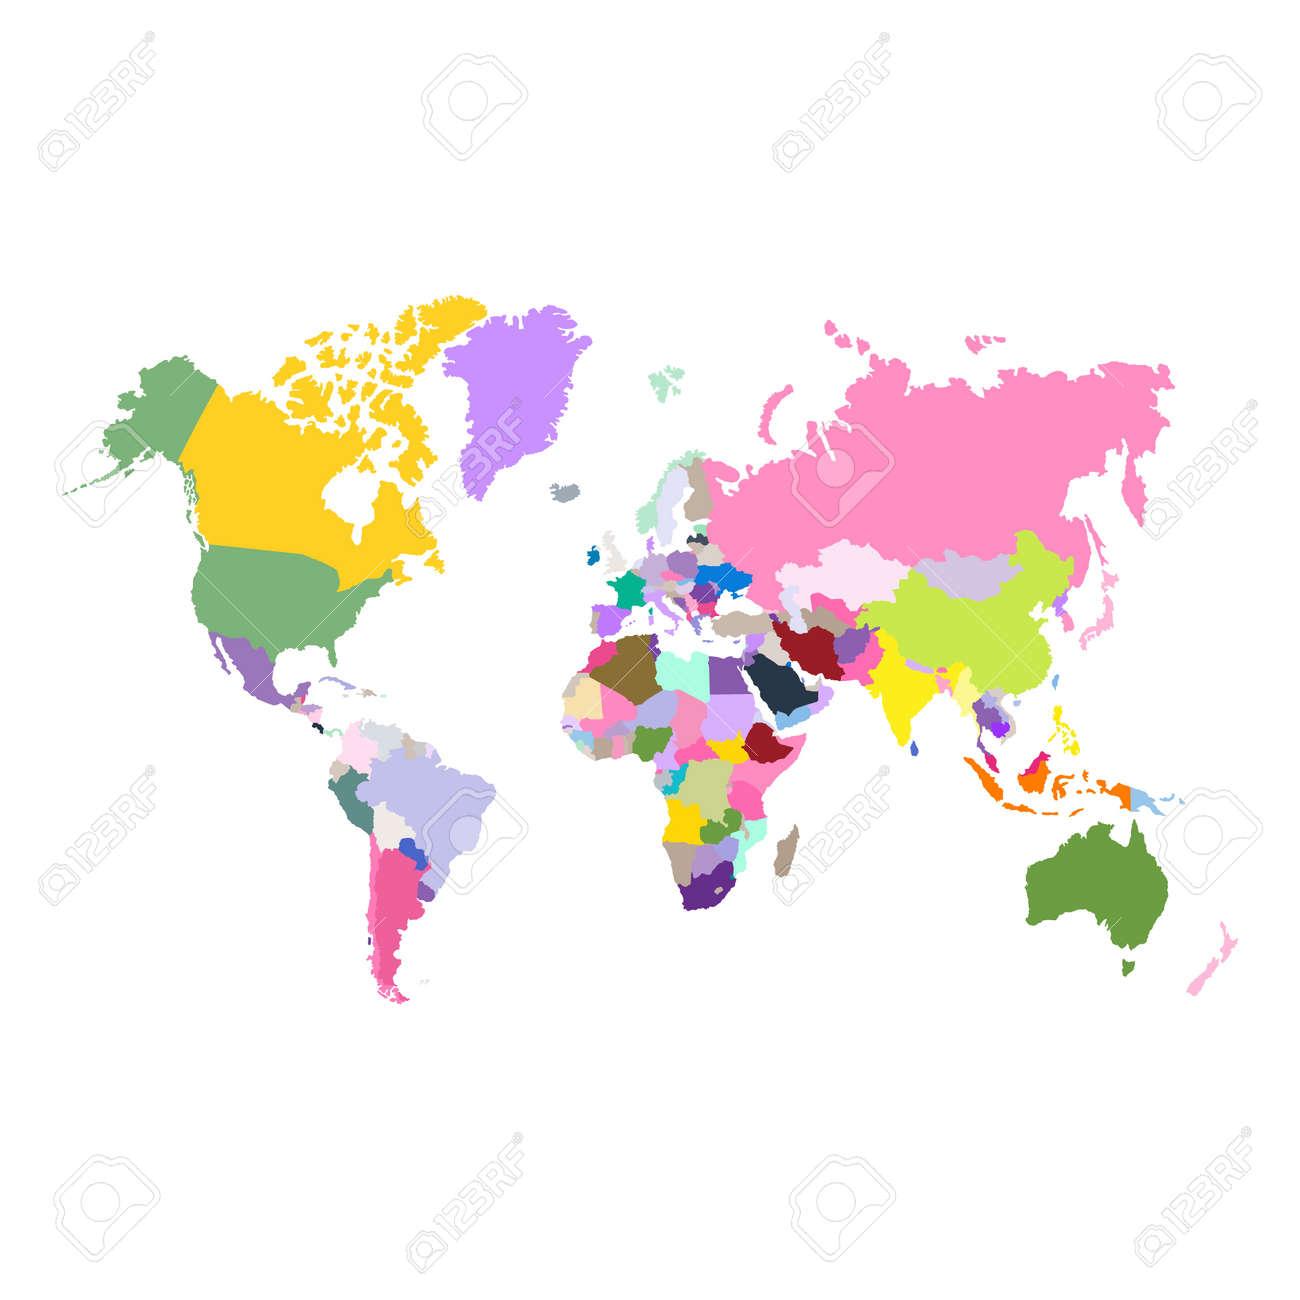 Vector political world map - 123256082